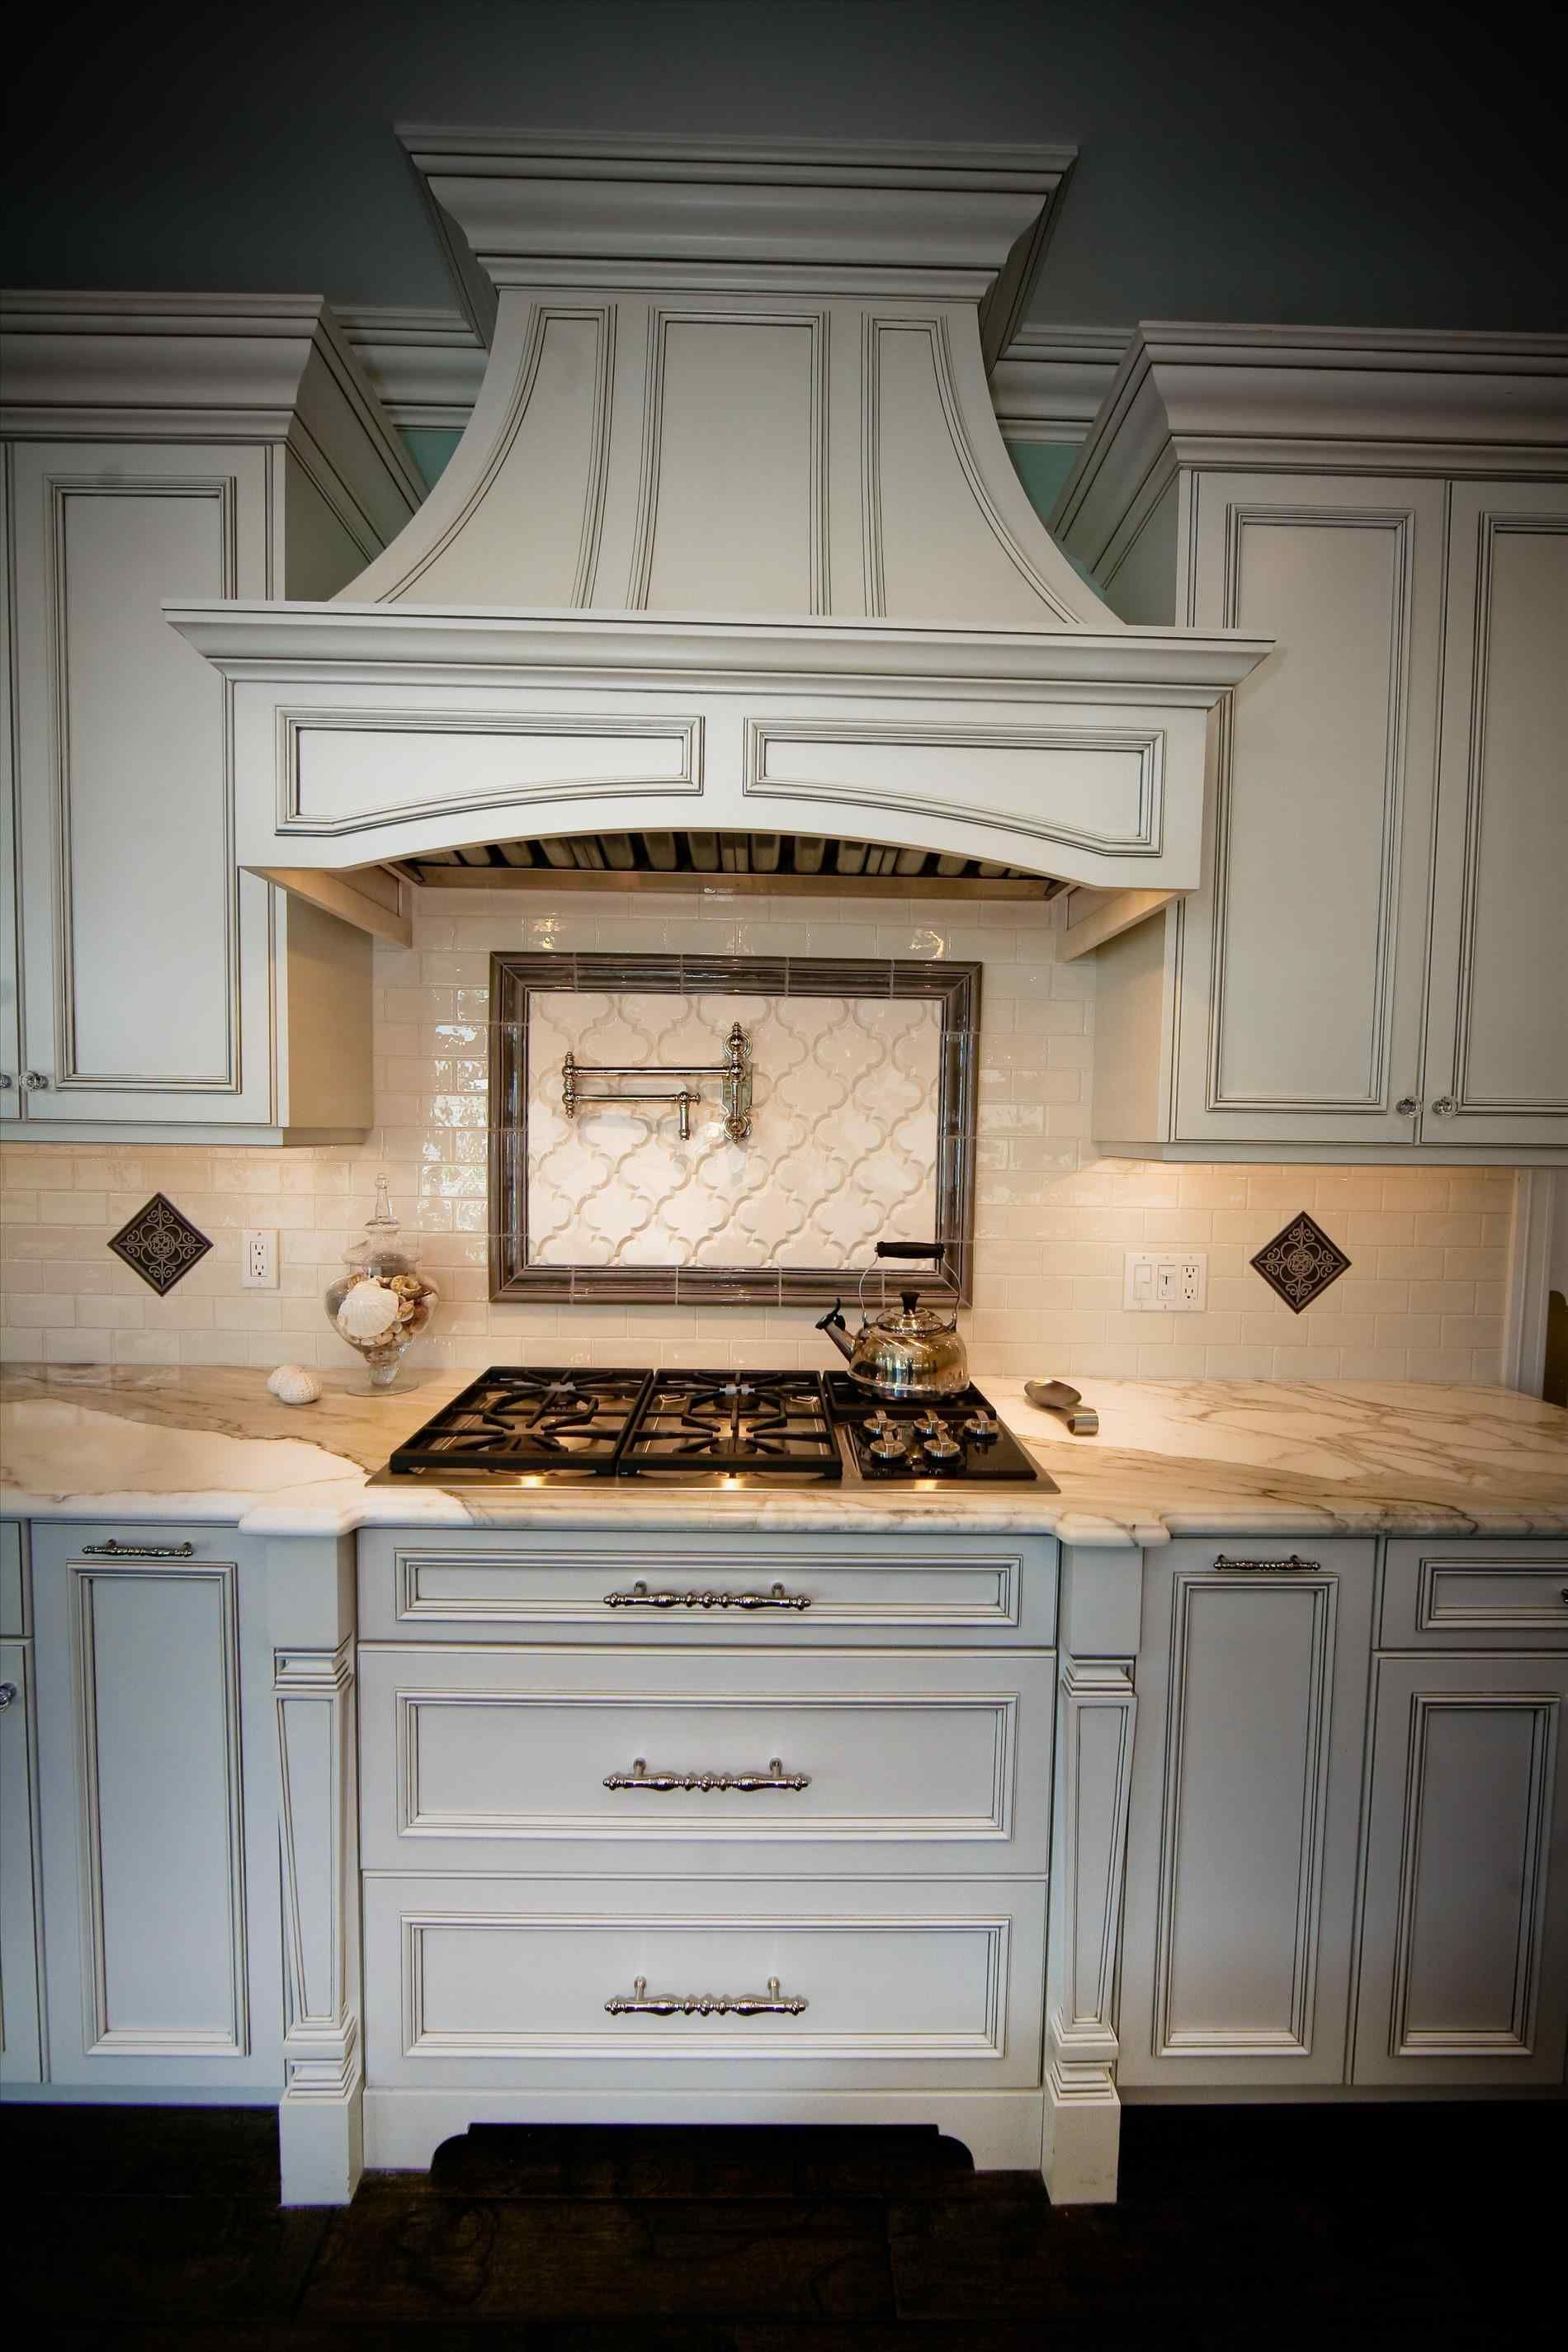 Design Line Kitchens In Sea Girt Njrhdesignlinekitchenscom White Shaker Cabinets